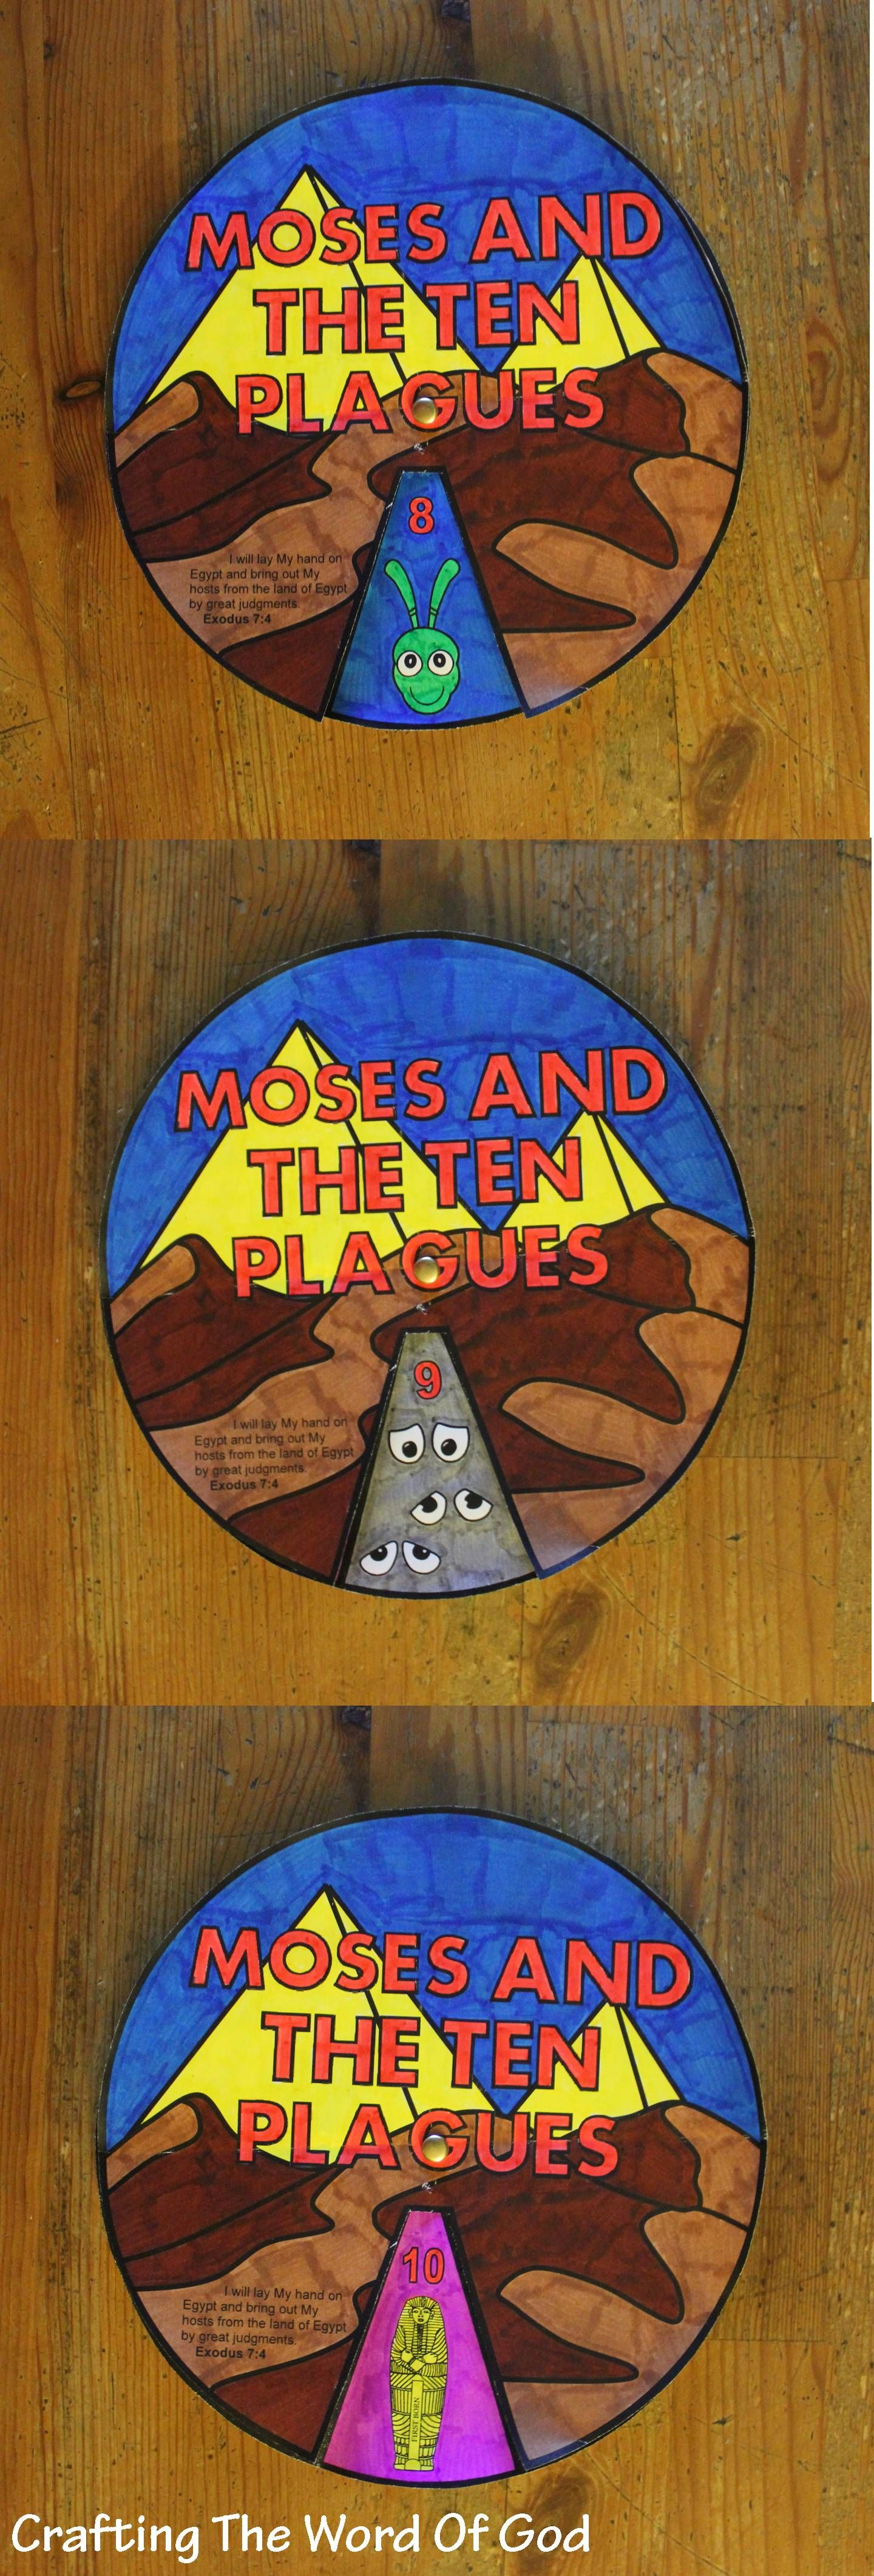 10 Plagues Of Egypt Wheel